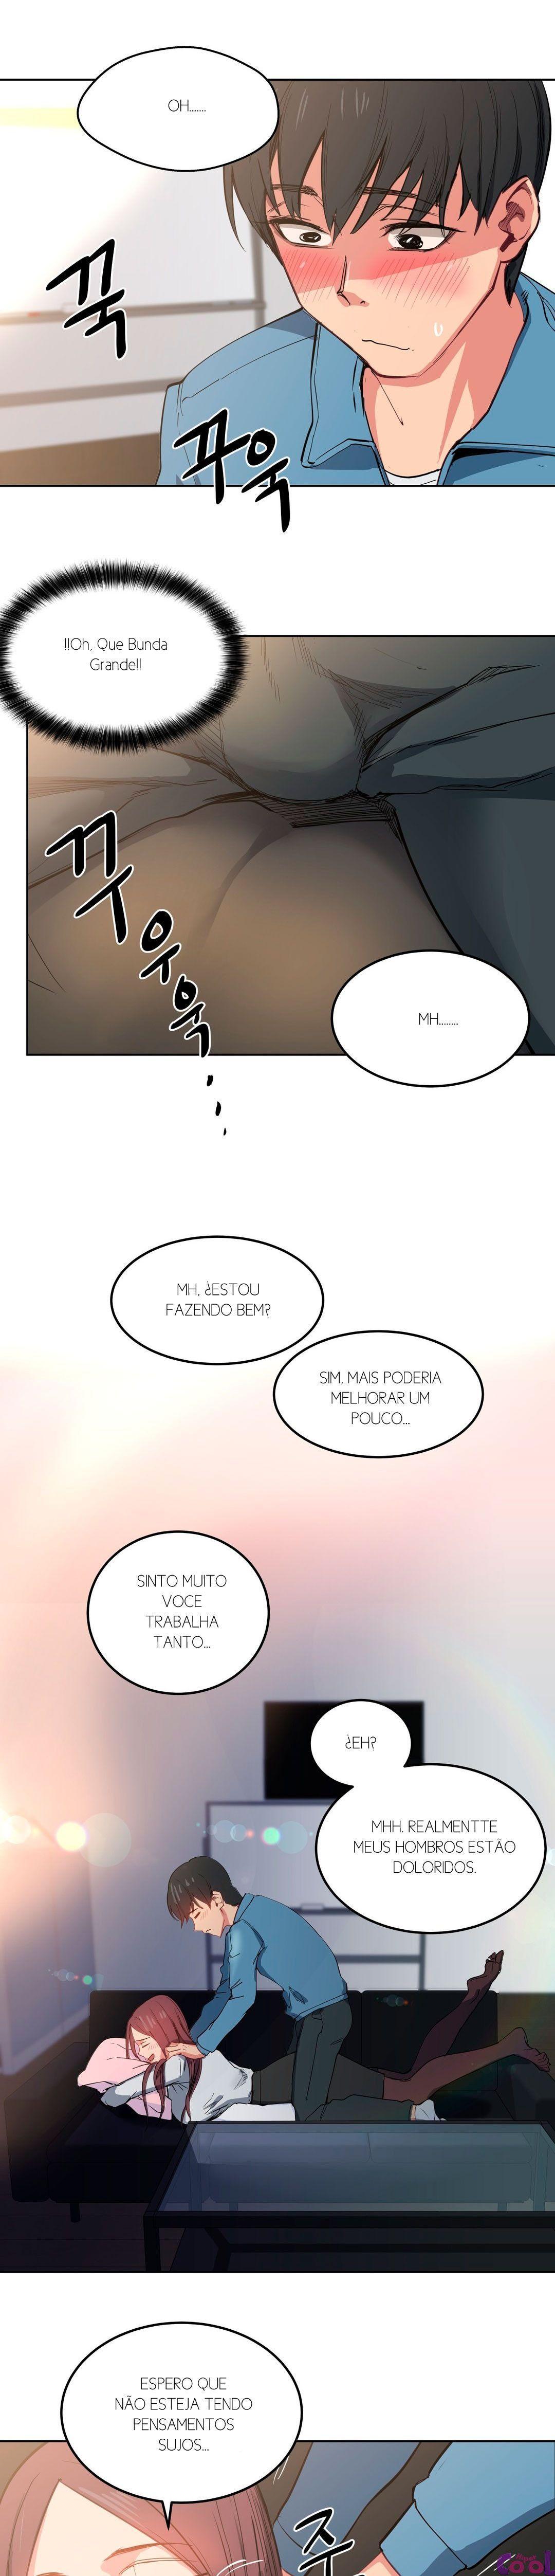 Cara sortudo 03